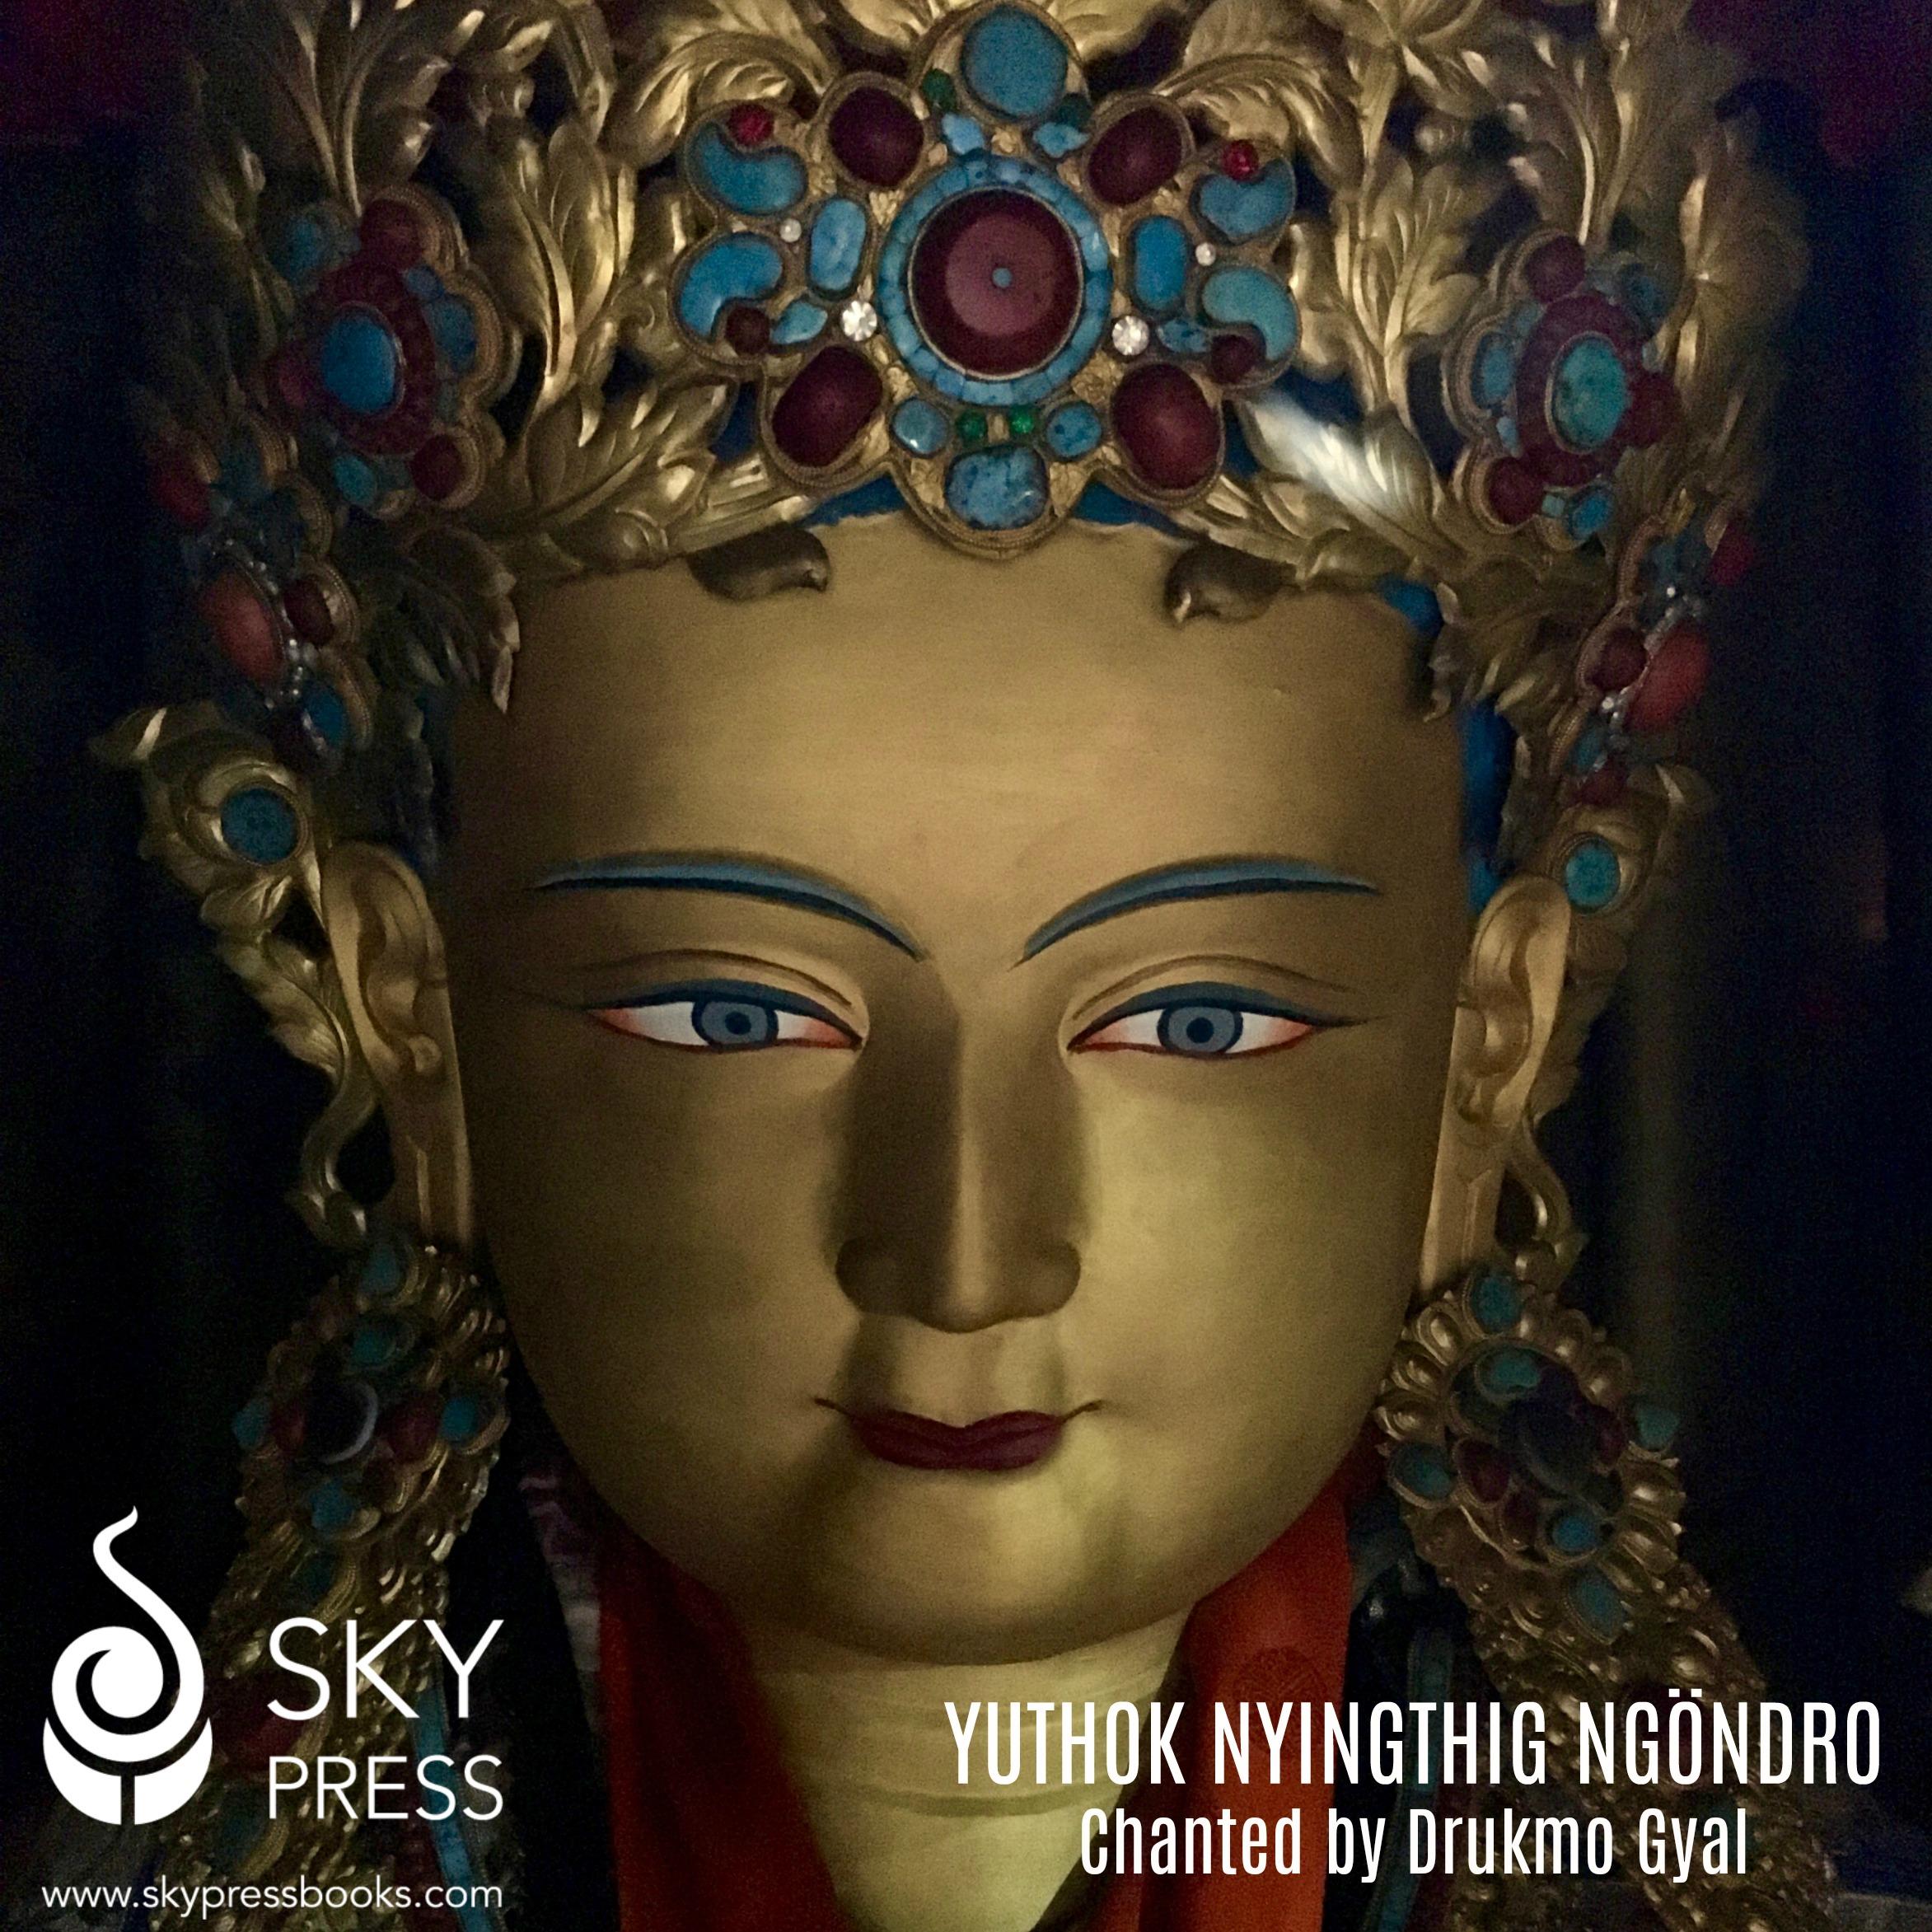 Yuthok Nyingthig Ngöndro - Complete chanting of the Yuthok Nyingthig preliminary practices by Drukmo Gyal.$10